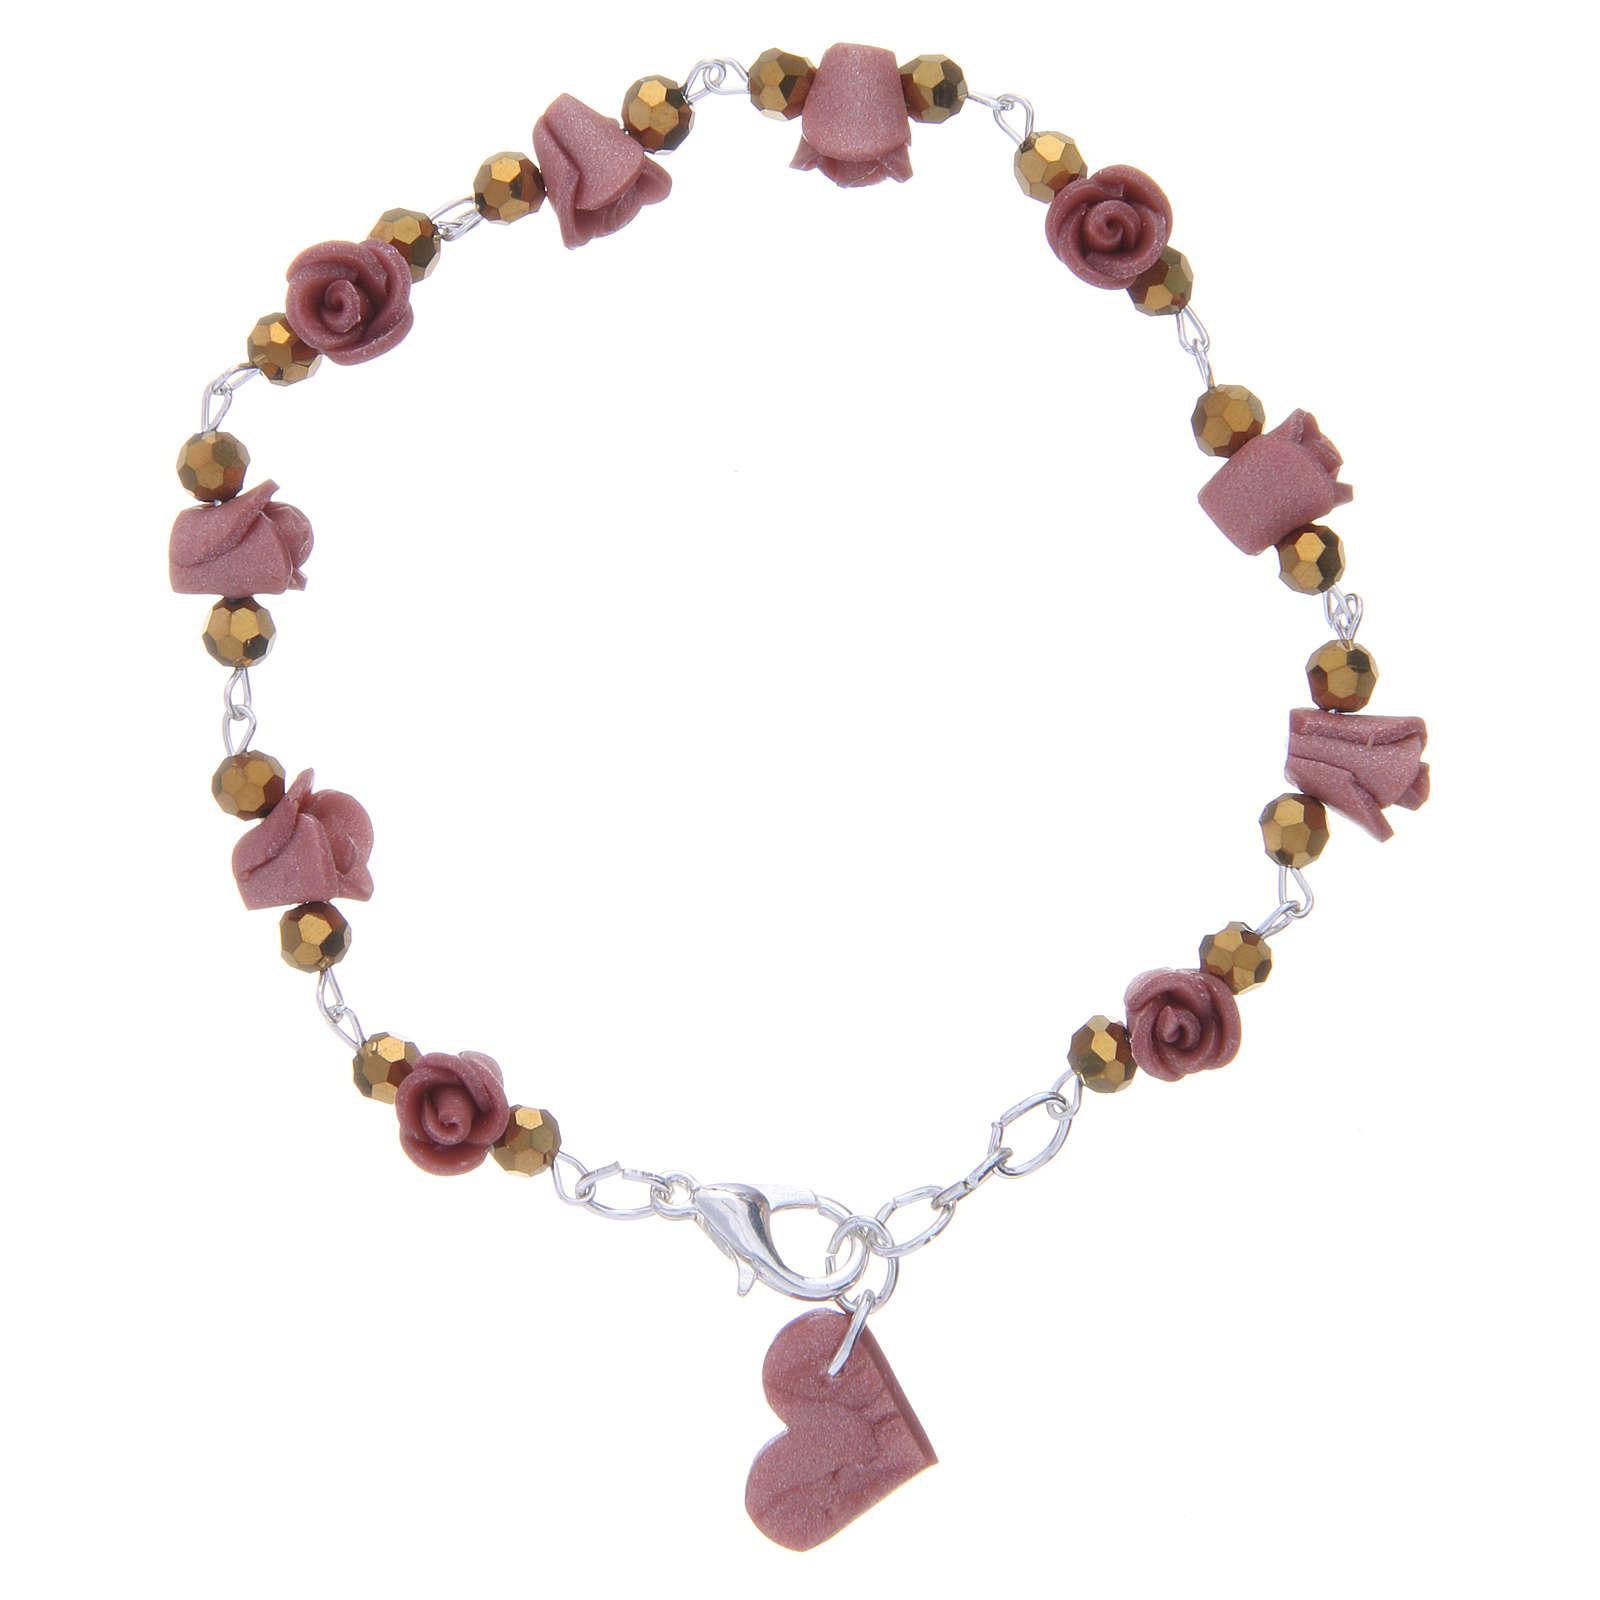 Pulsera Medjugorje rosas cerámica cuentas cristal 4